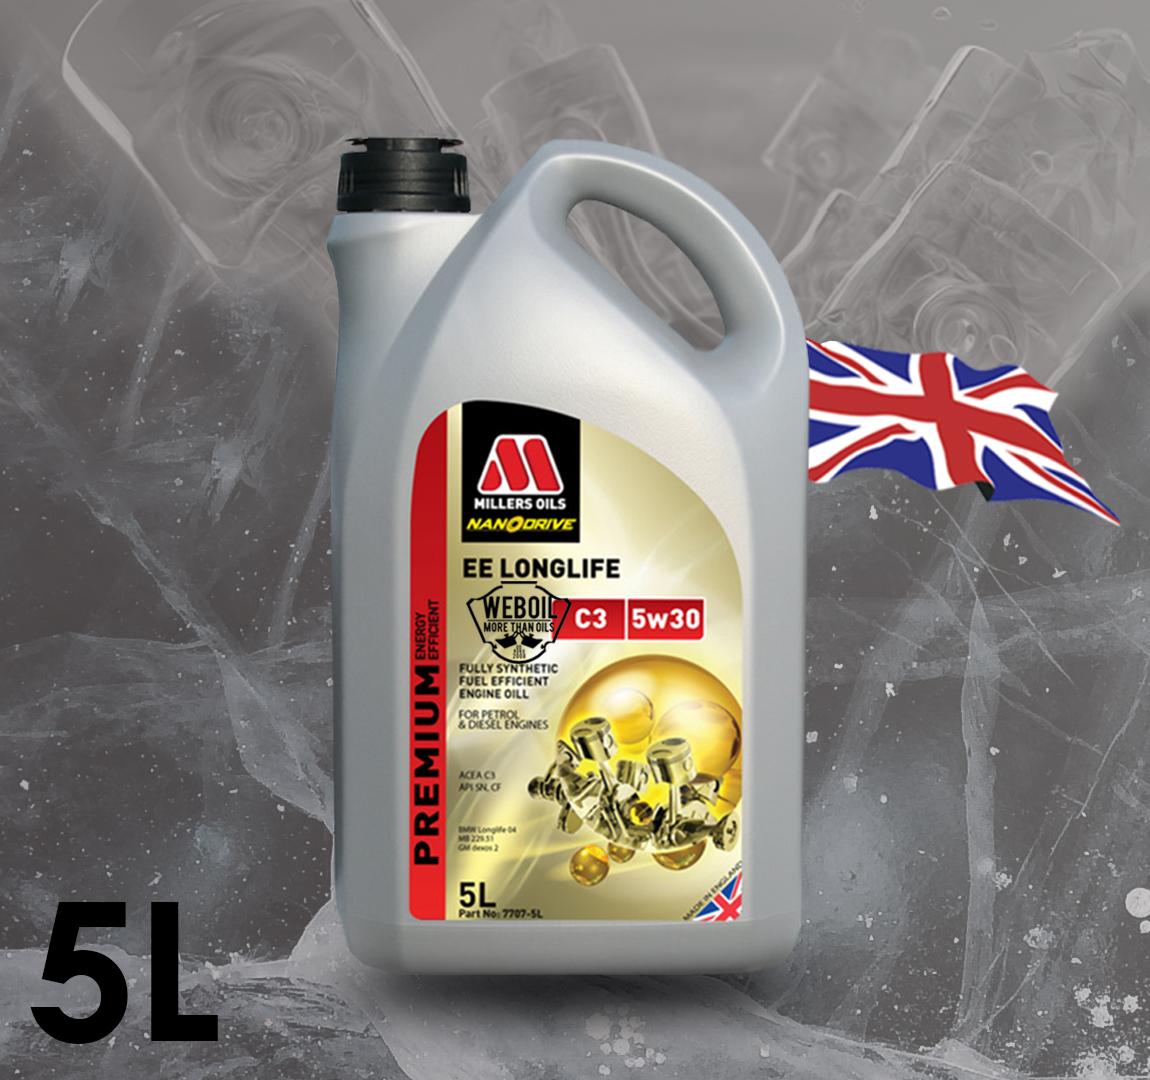 e8c7ef8933 Motorový olej Millers oils EE Longlife C3 5w-30 5l